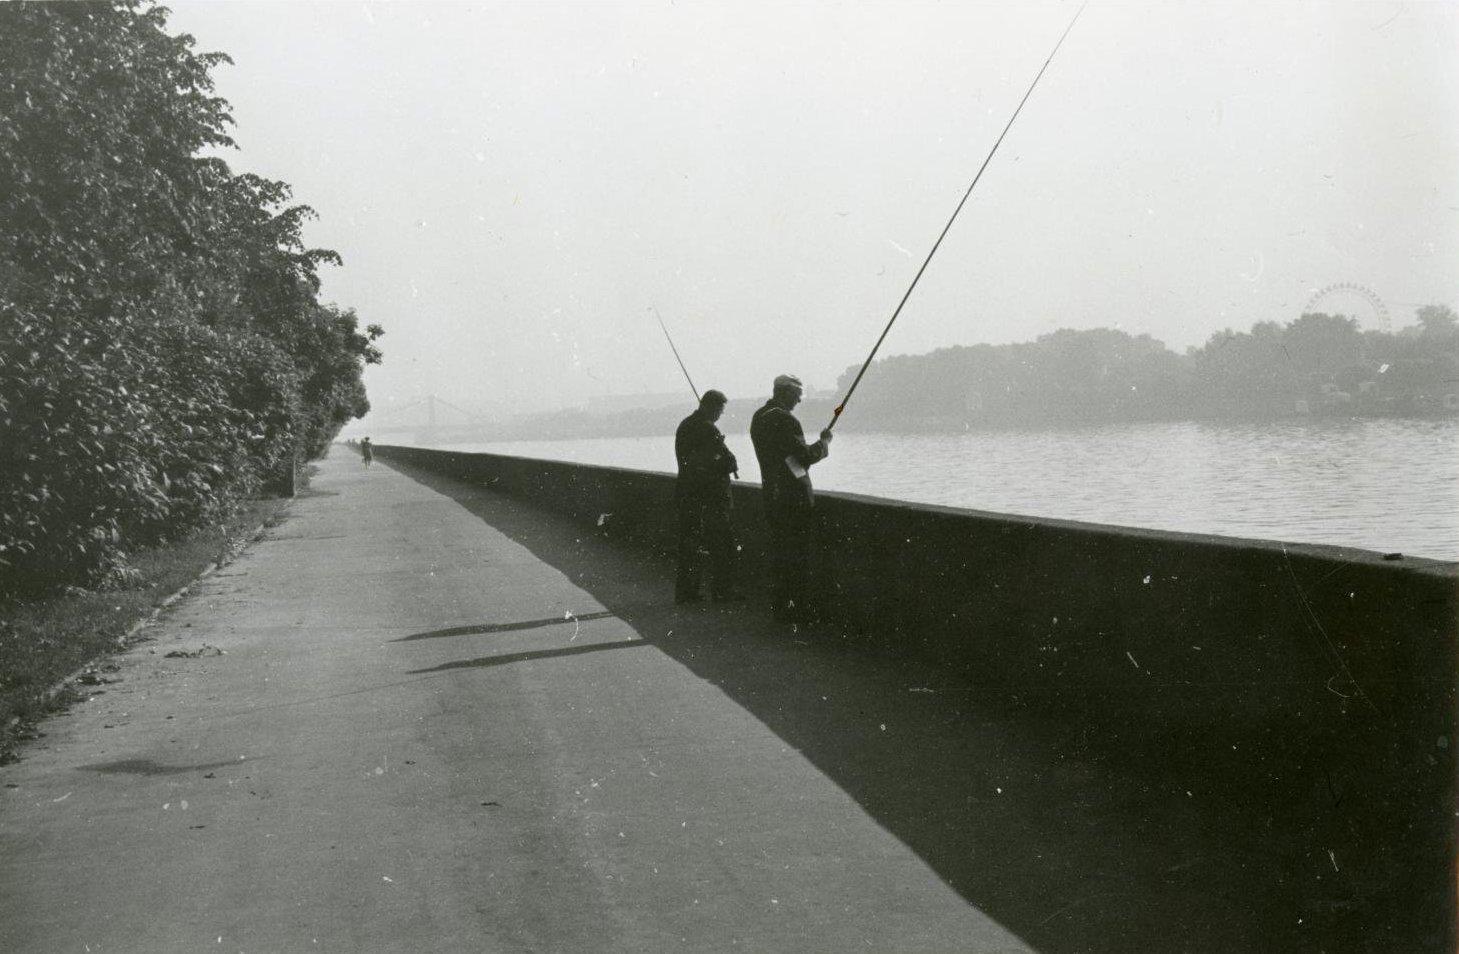 1970-е. Рыбаки на Фрунзенской набережной